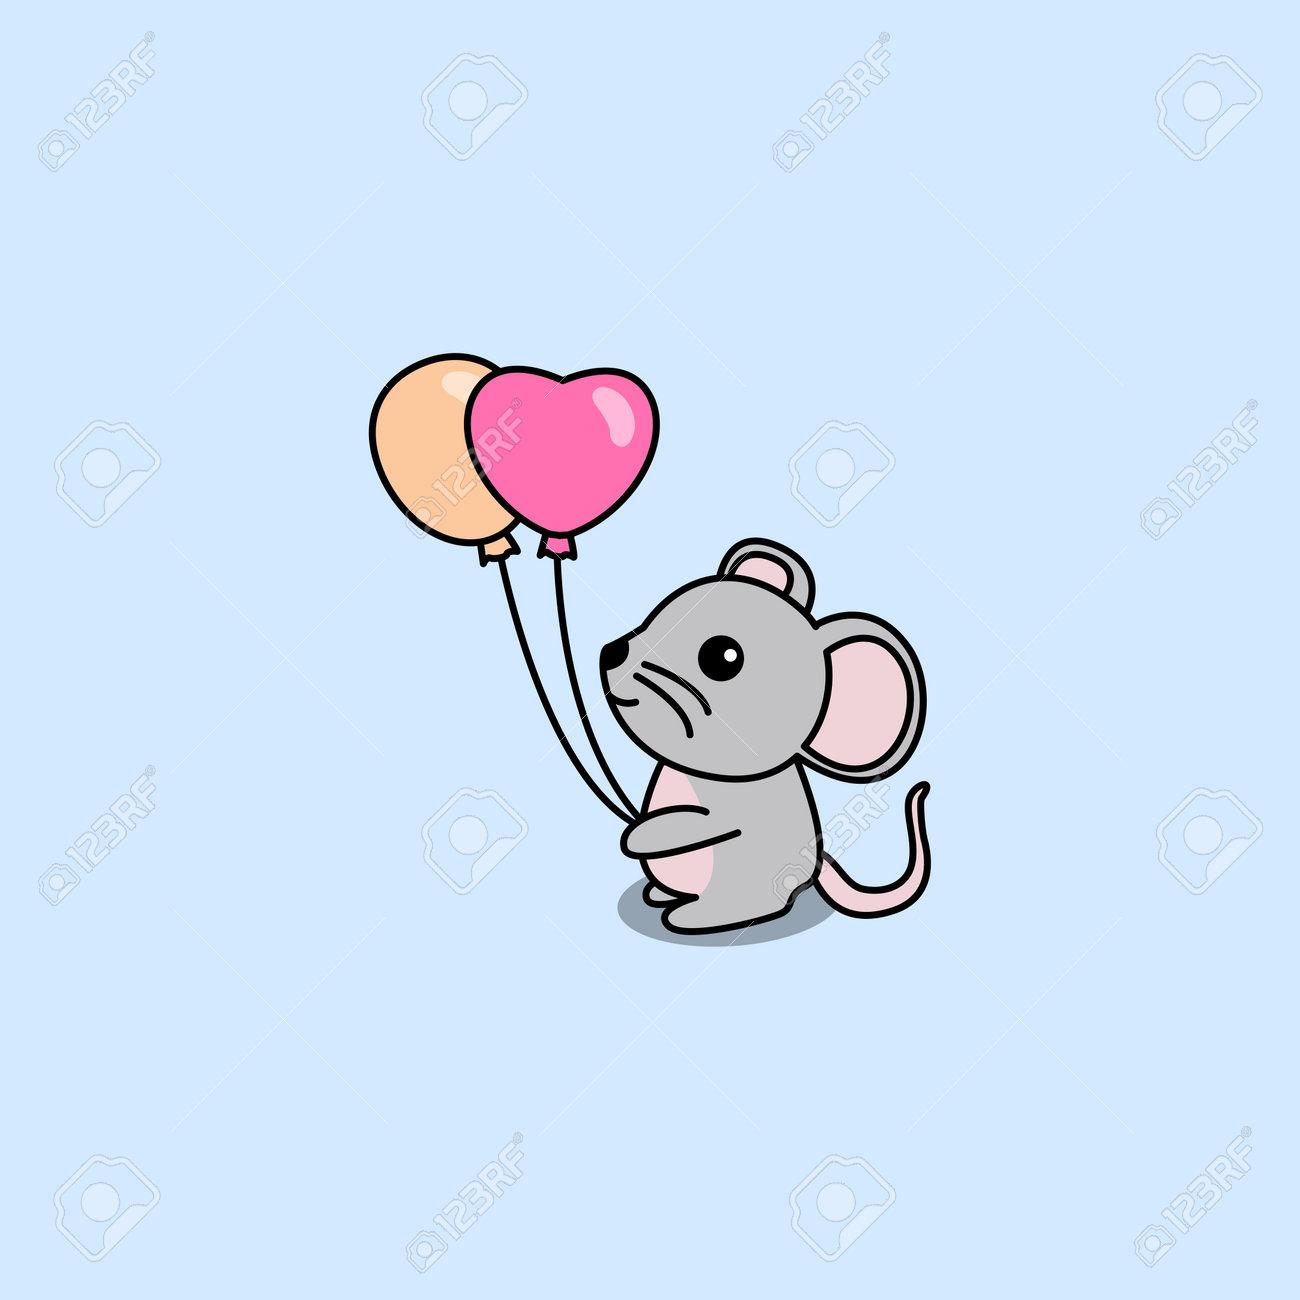 Cute mouse holding balloons cartoon, vector illustration - 169151631